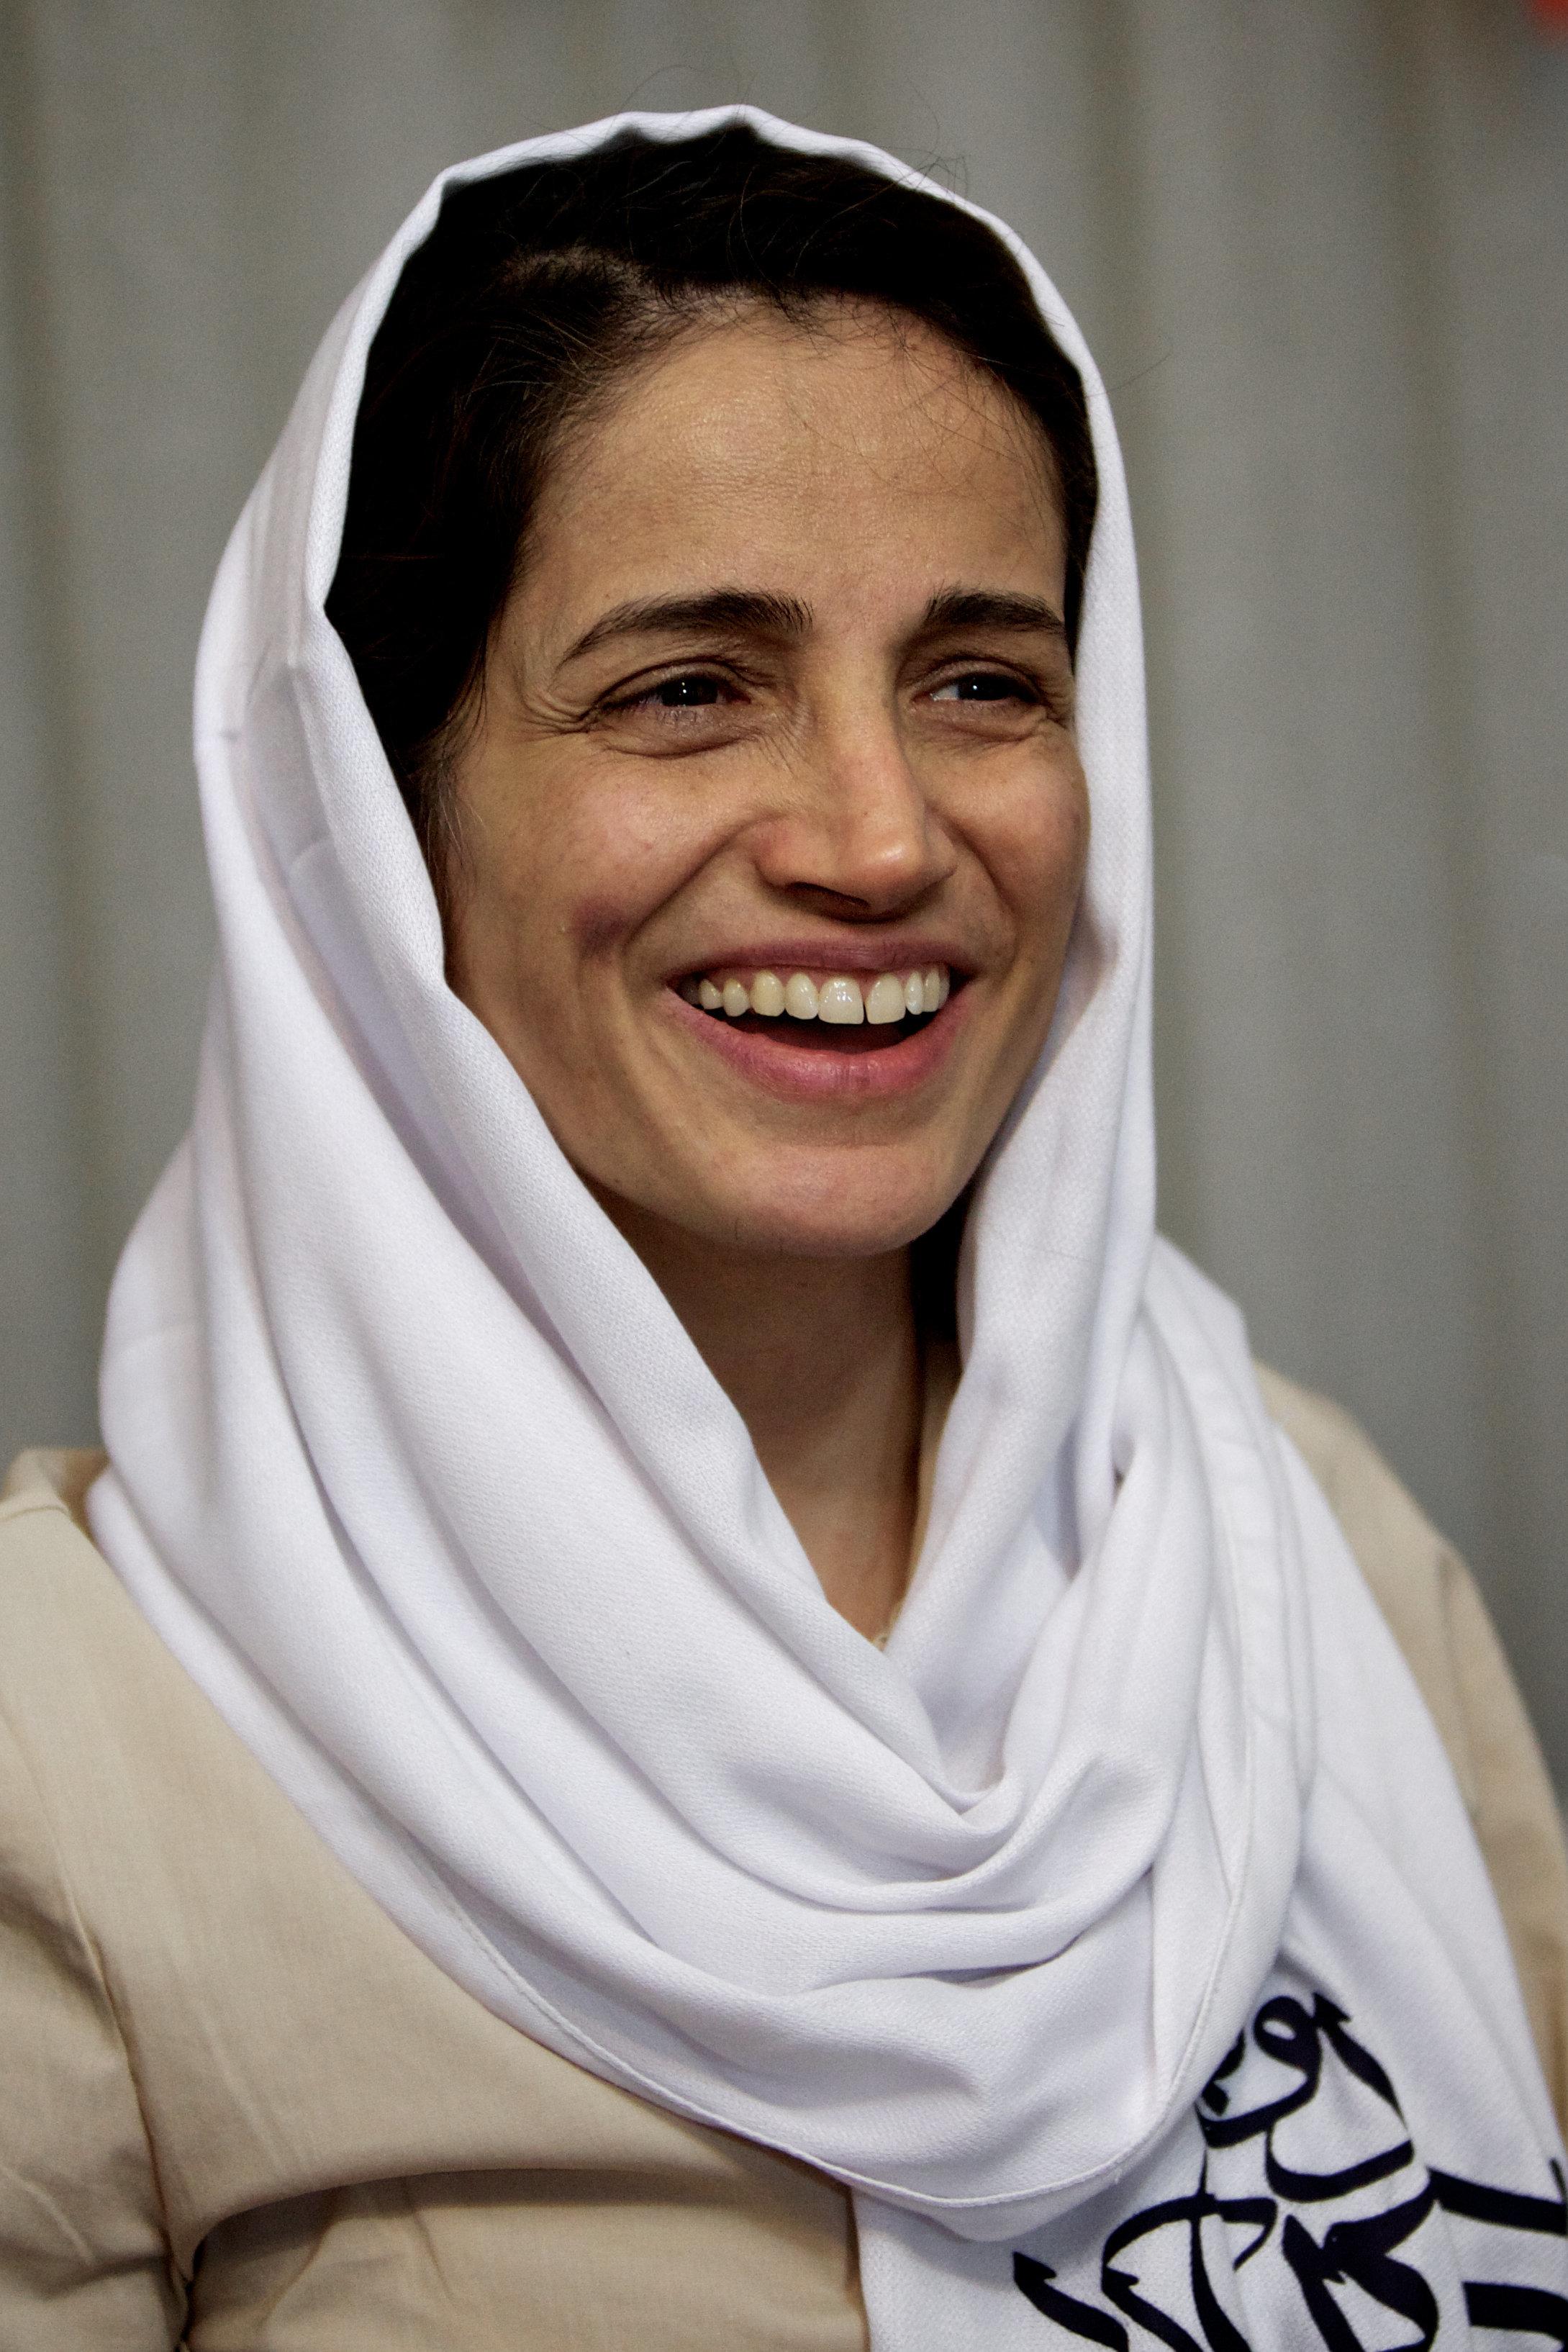 #FreeNasrin: La condamnation d'une avocate iranienne mobilise la communauté